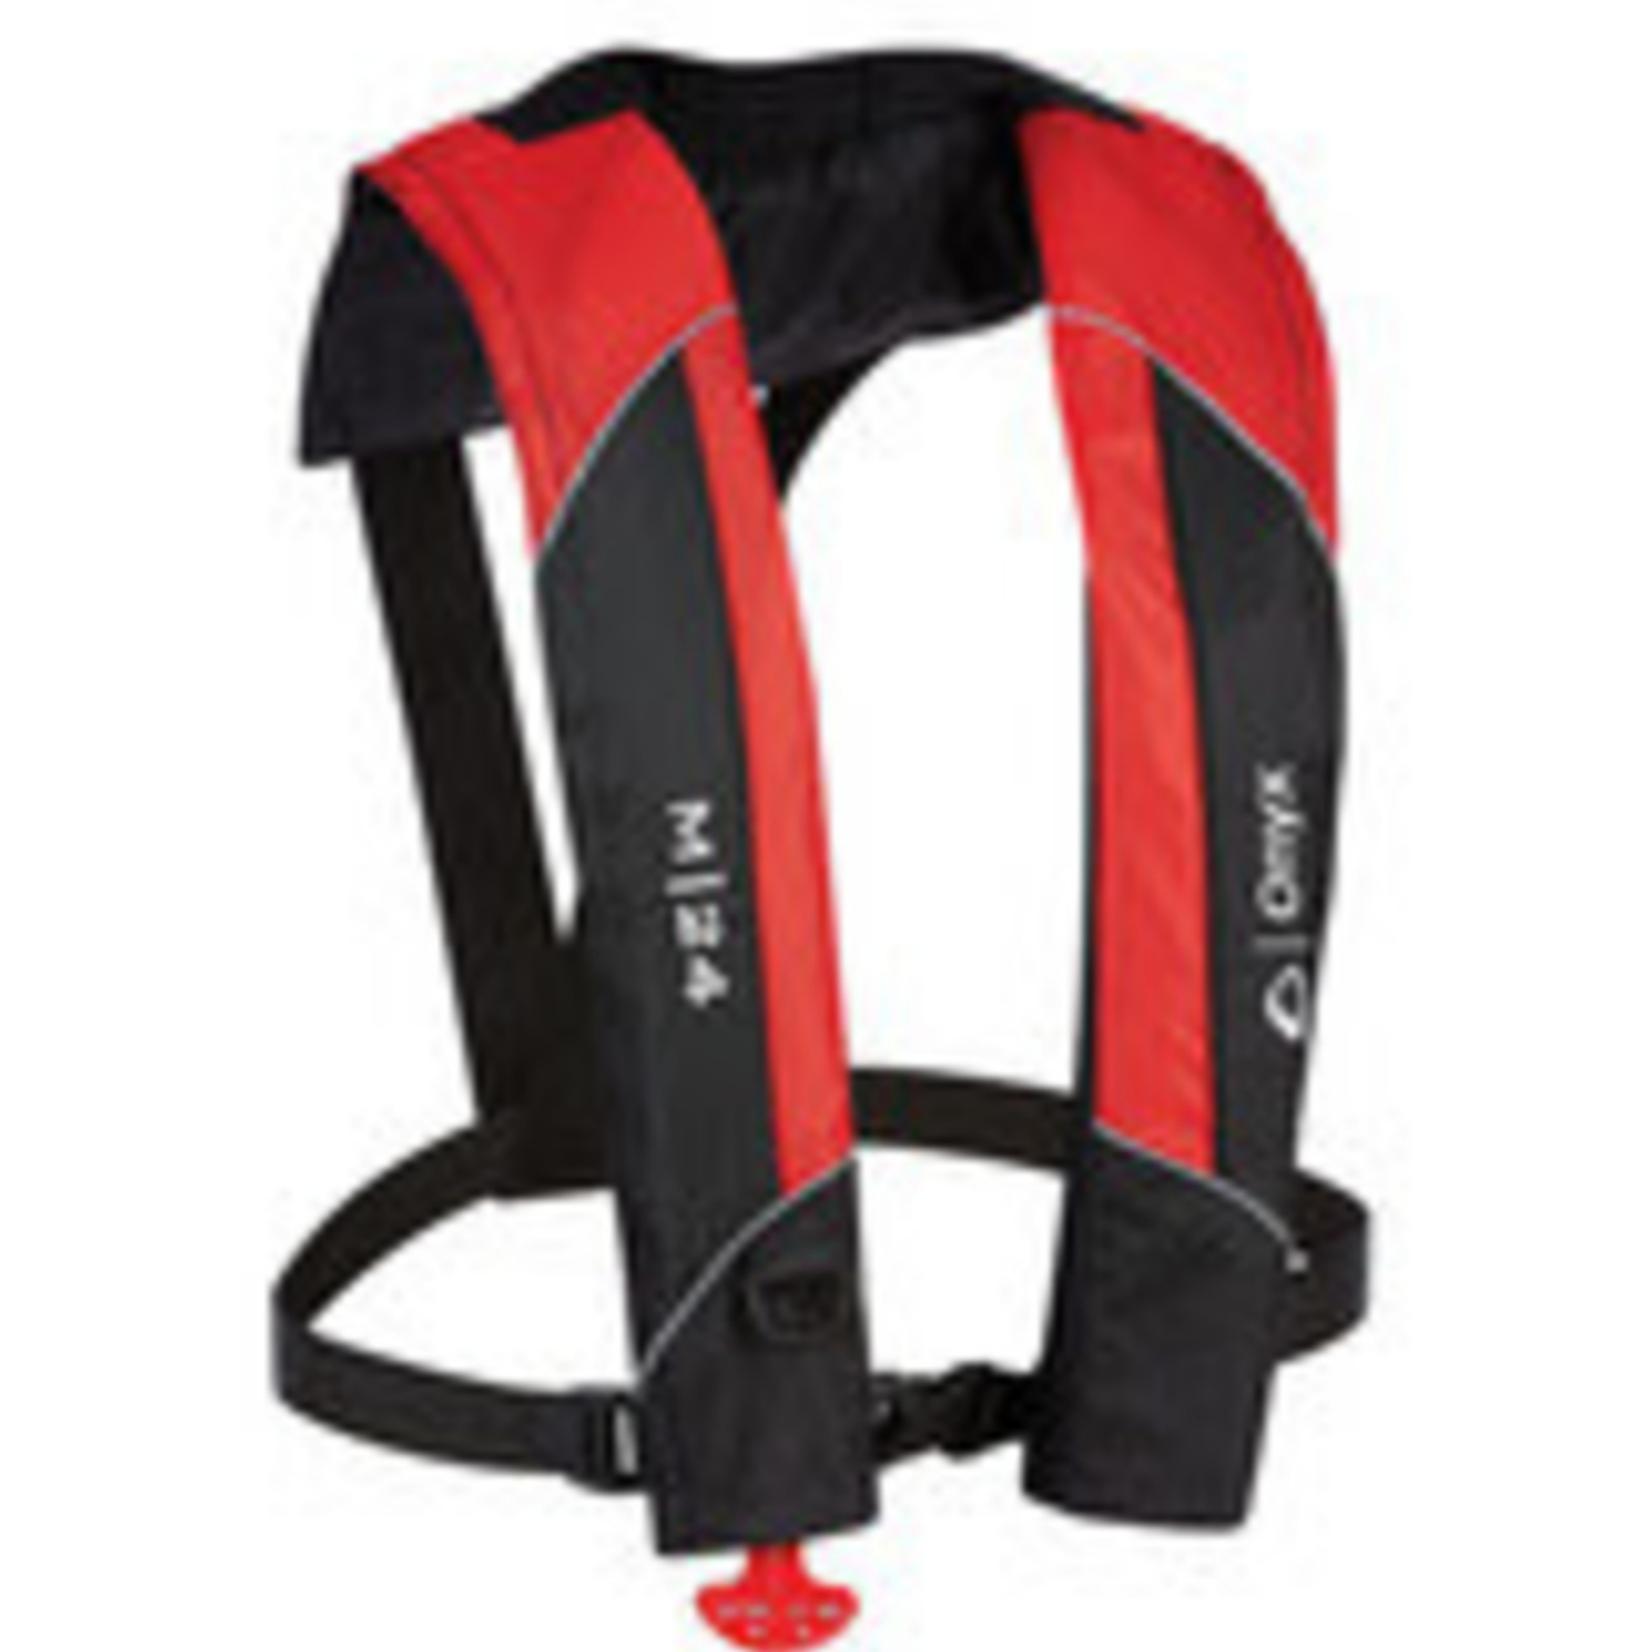 Onyx Onyx M-24 Manual Inflatable Life Jacket (PFD)